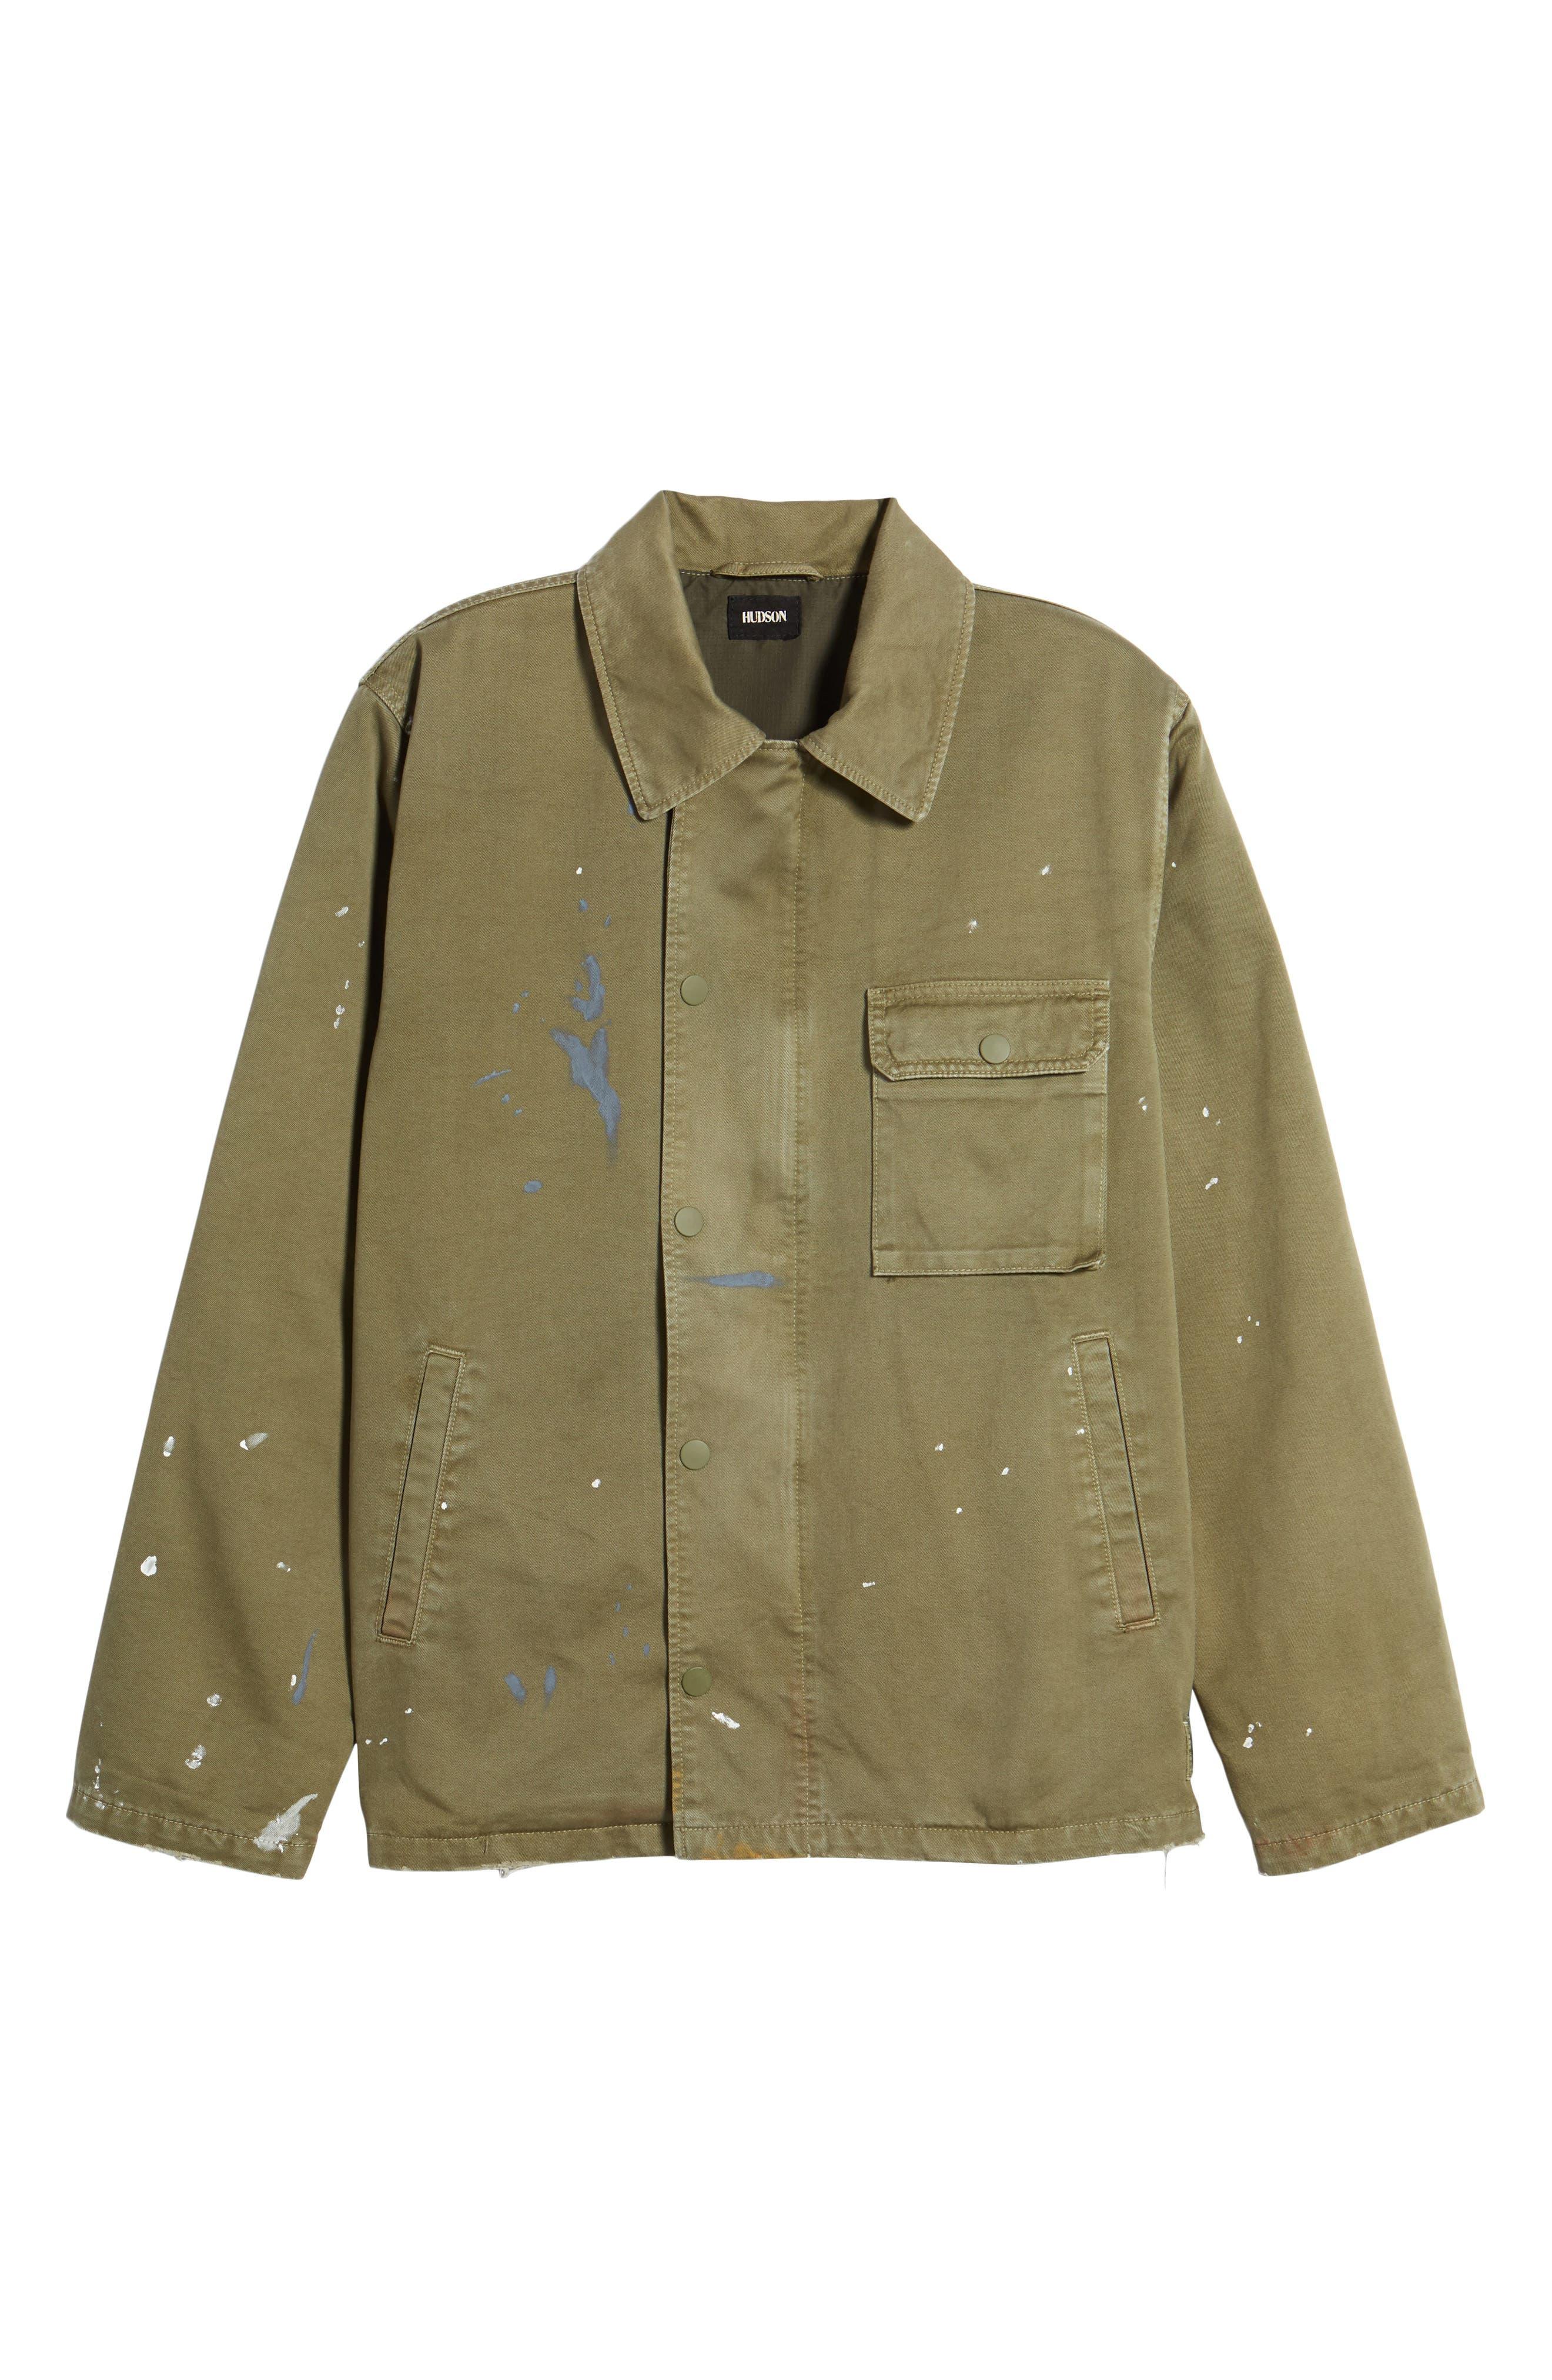 Hudson Military Jacket,                             Alternate thumbnail 5, color,                             Army Paint